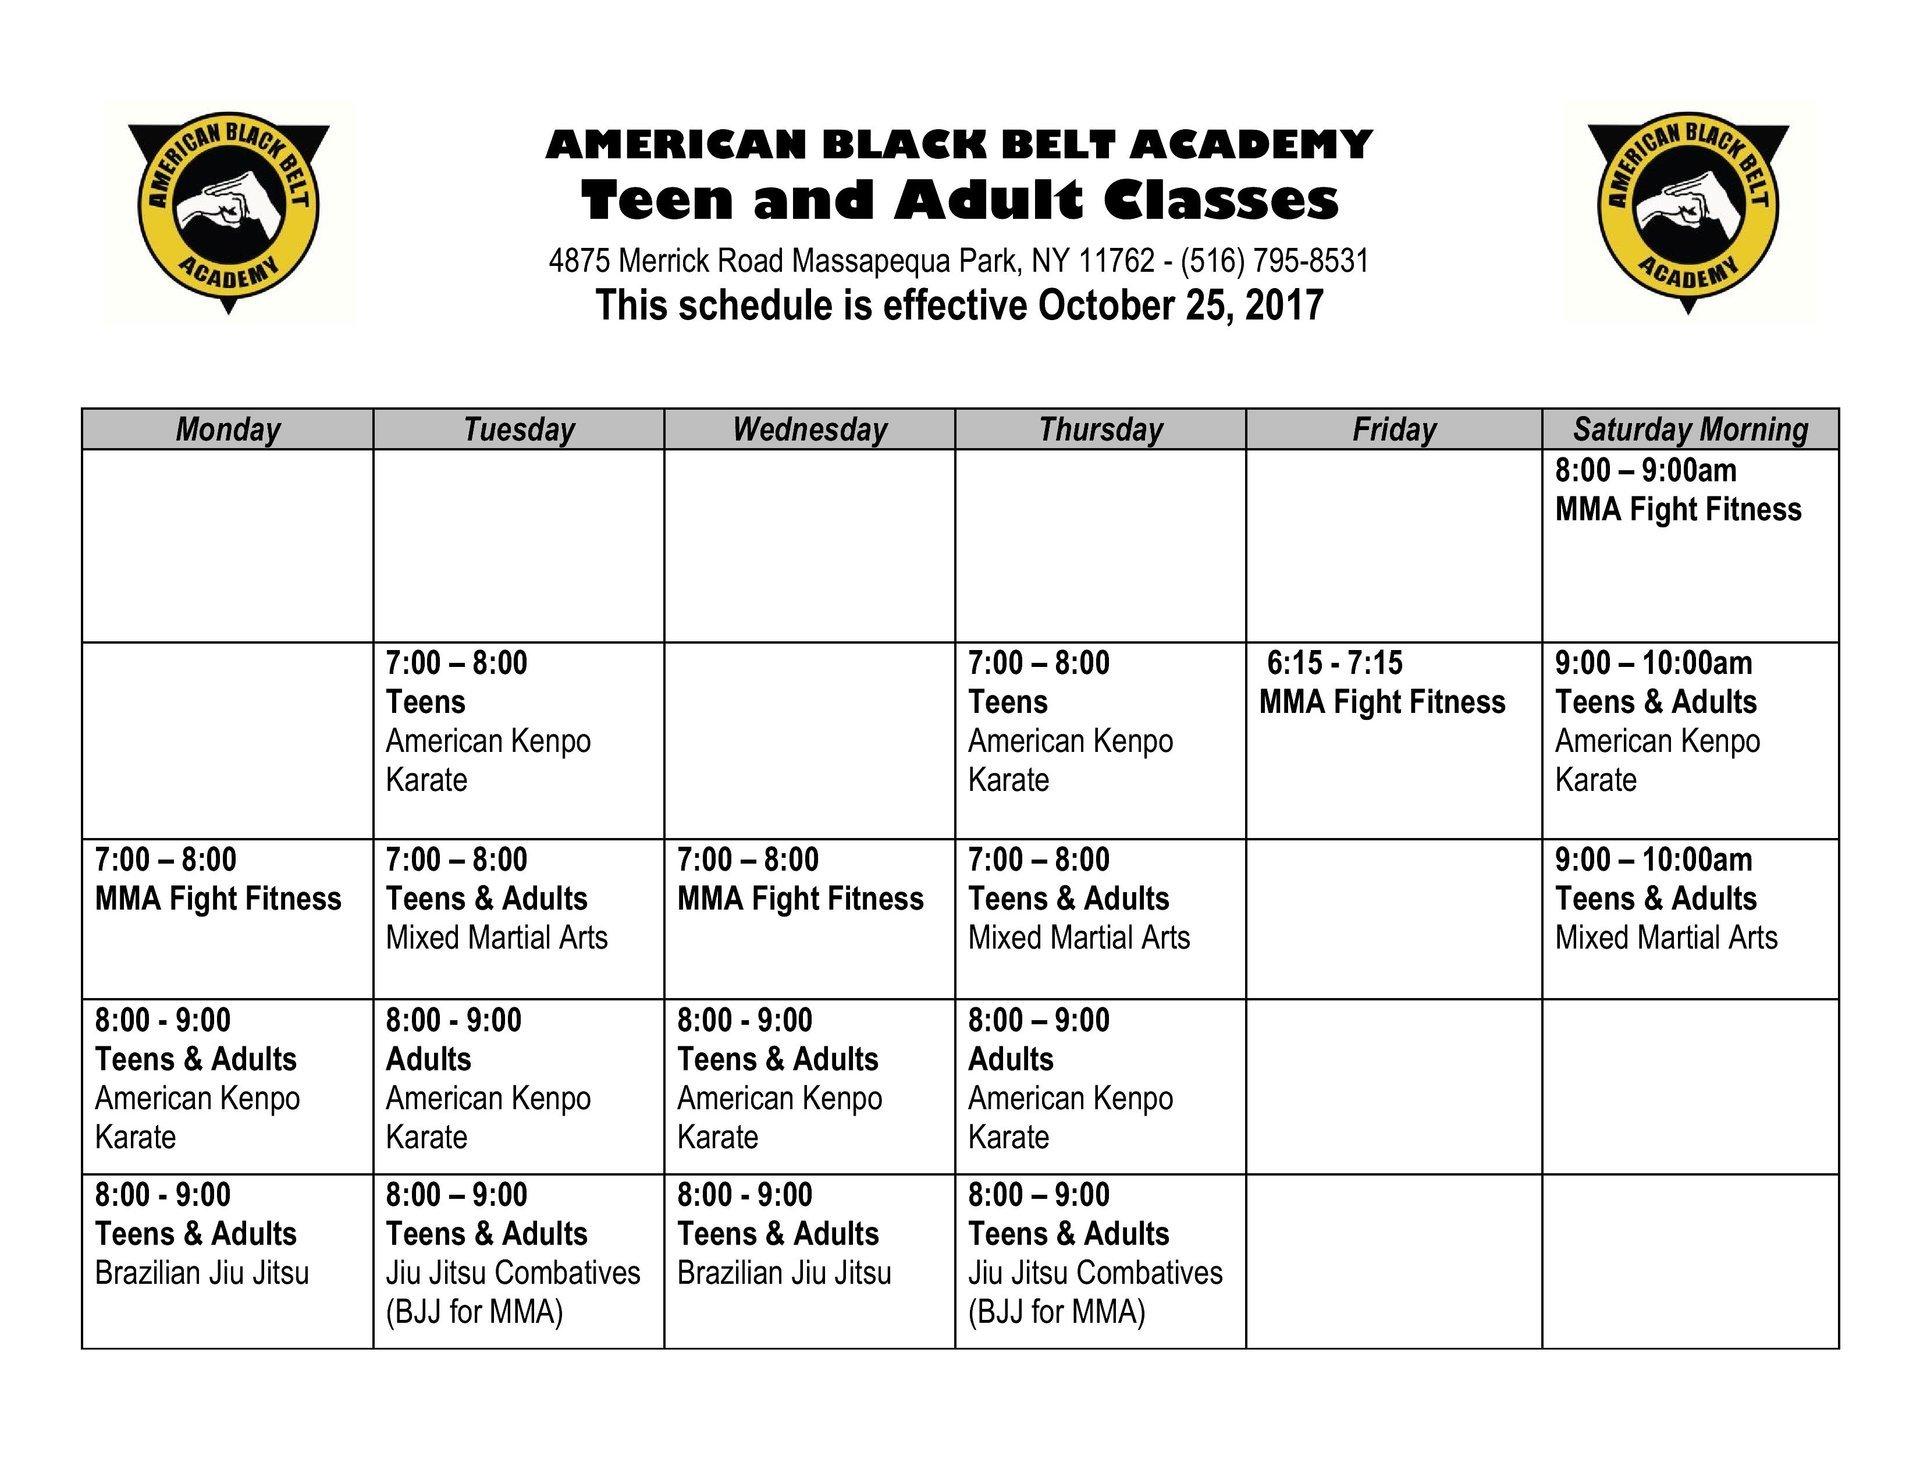 Adult Mixed Martial Arts Class Schedule in Massapequa Park, NY